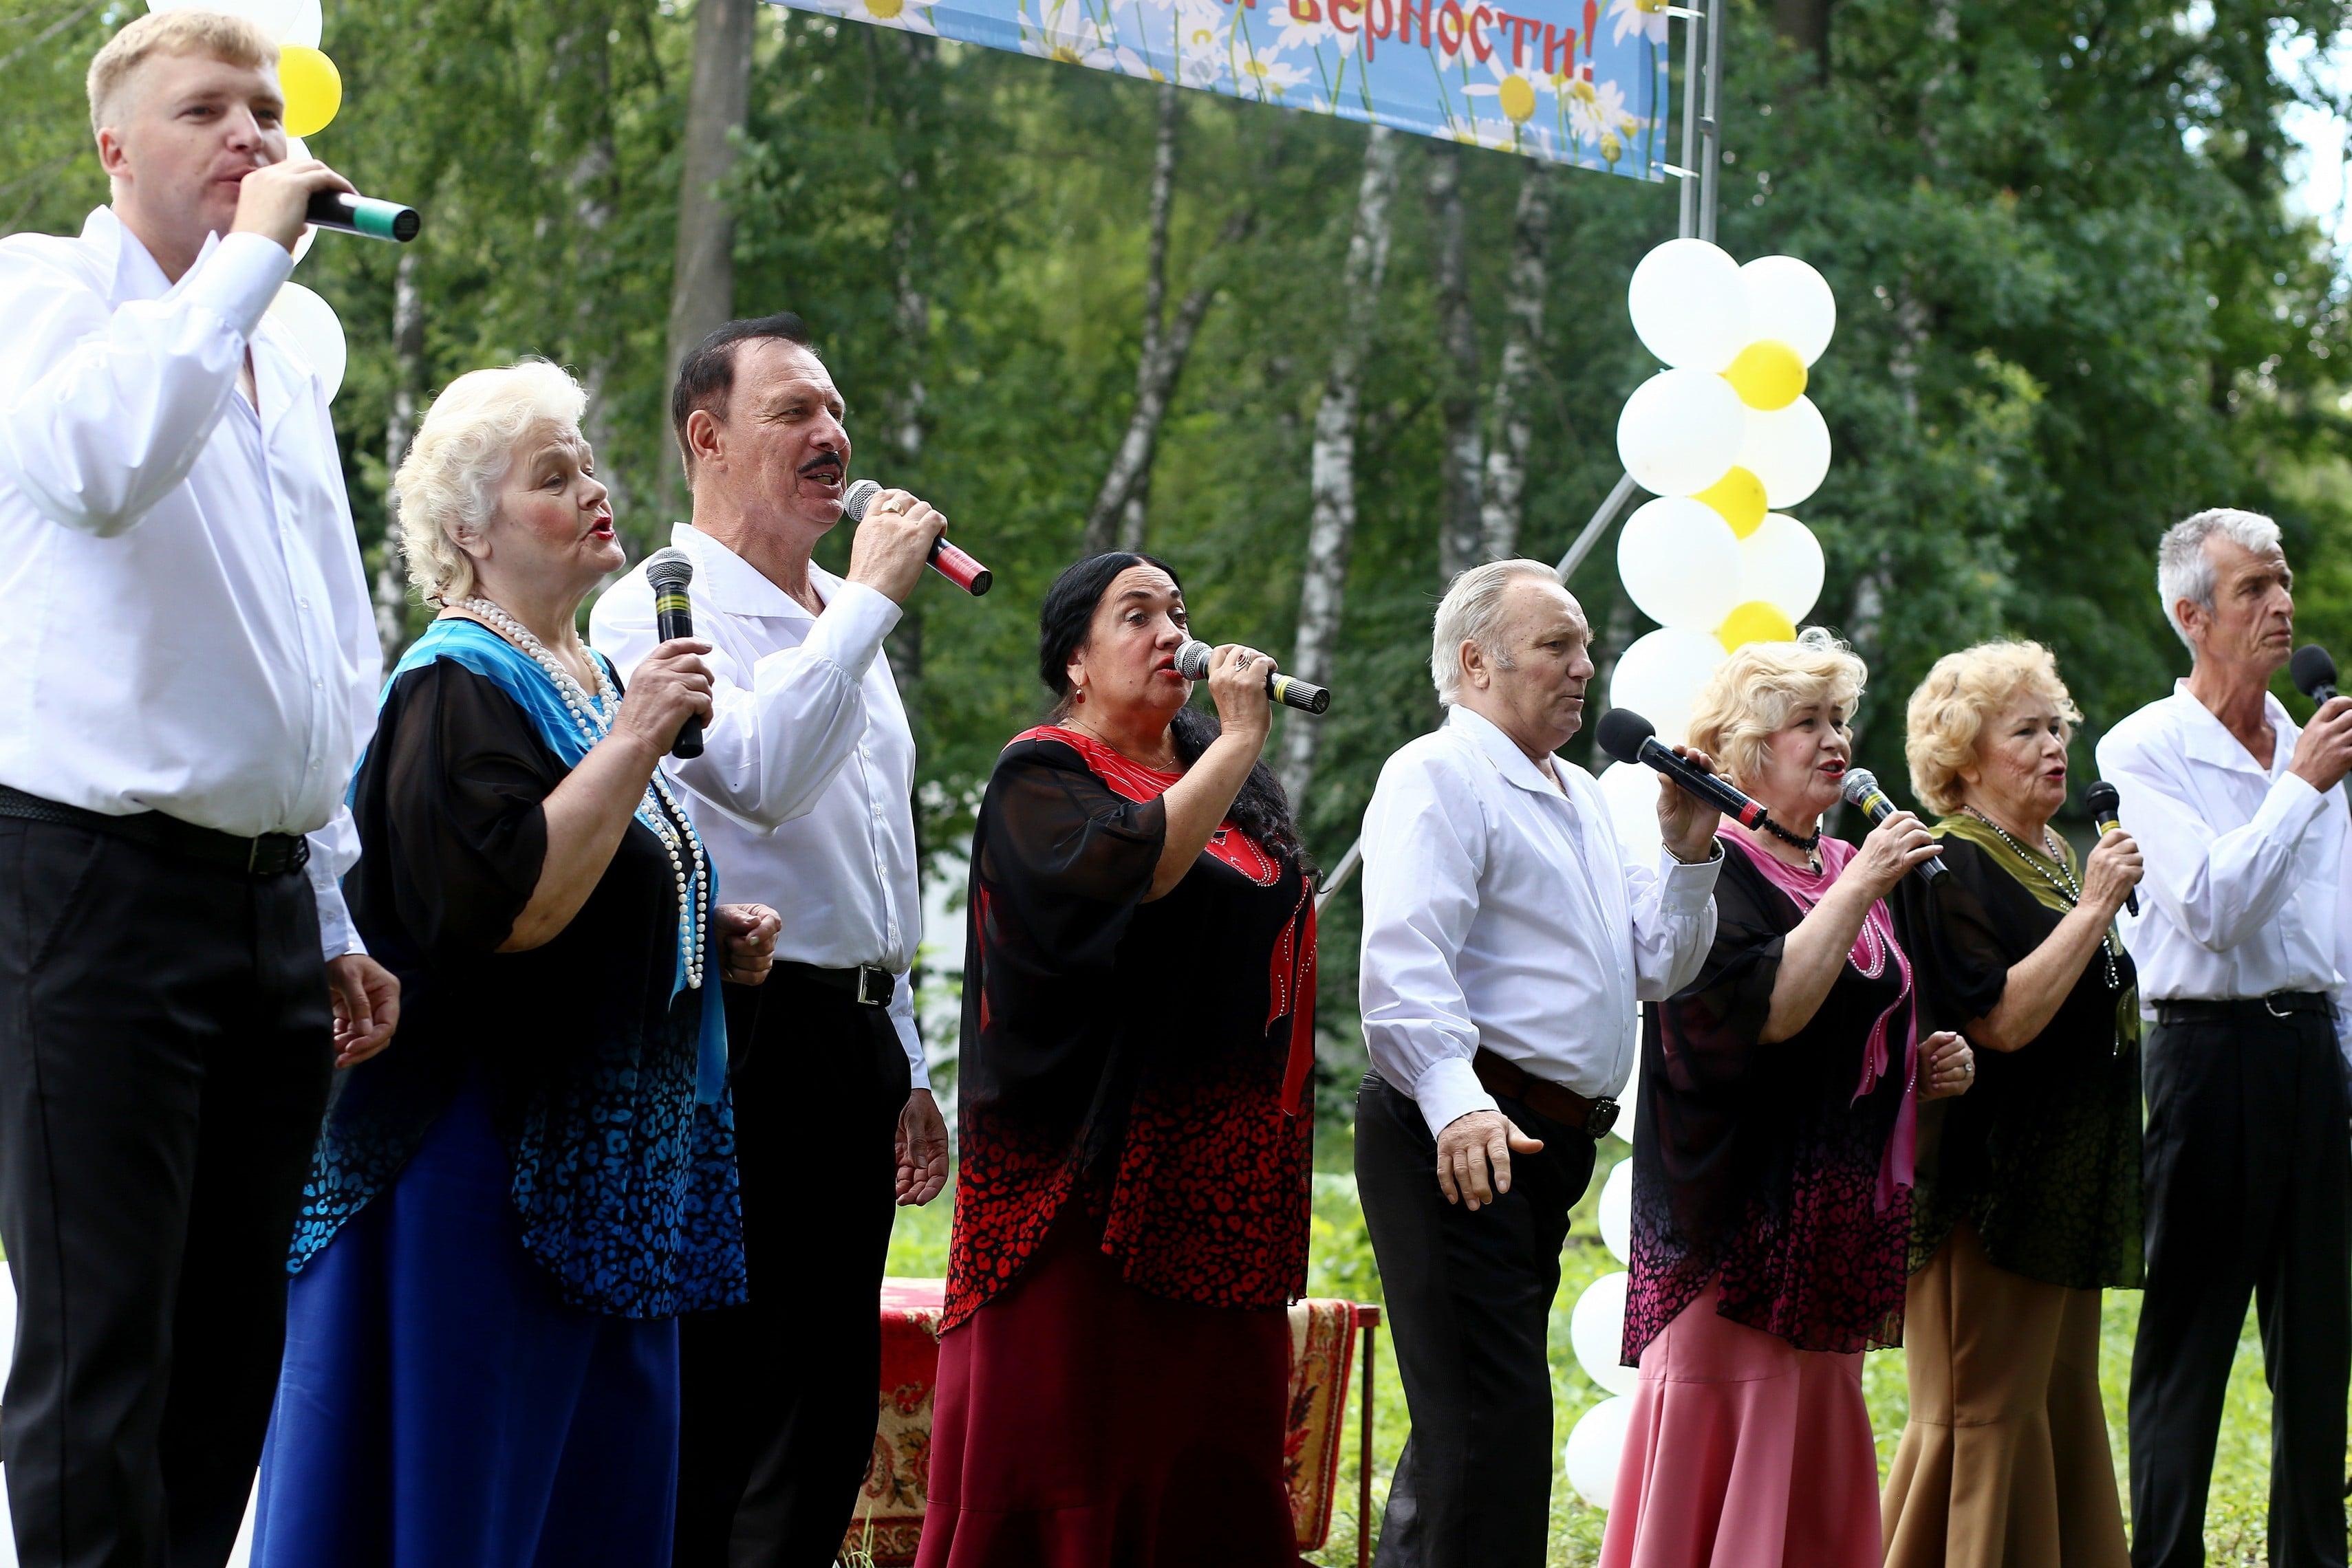 http://monuspen.ru/photoreports/14b72a43bf568736ebc953d1a903f332.jpg